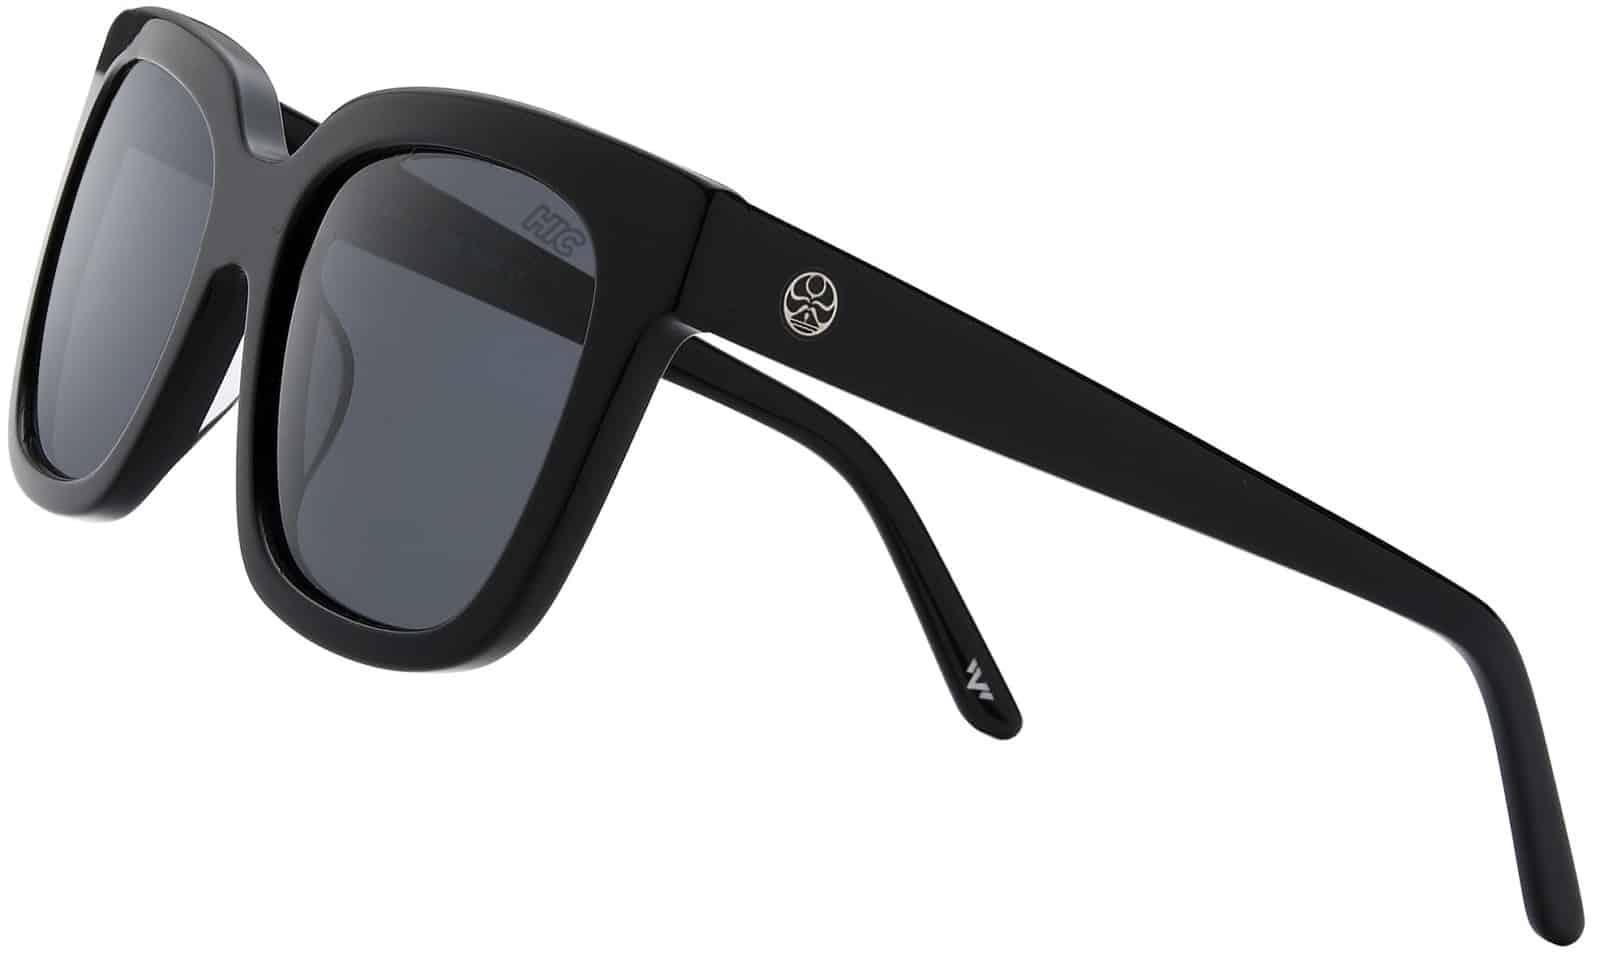 premium fashion sunglasses - HIC GALLANT ses